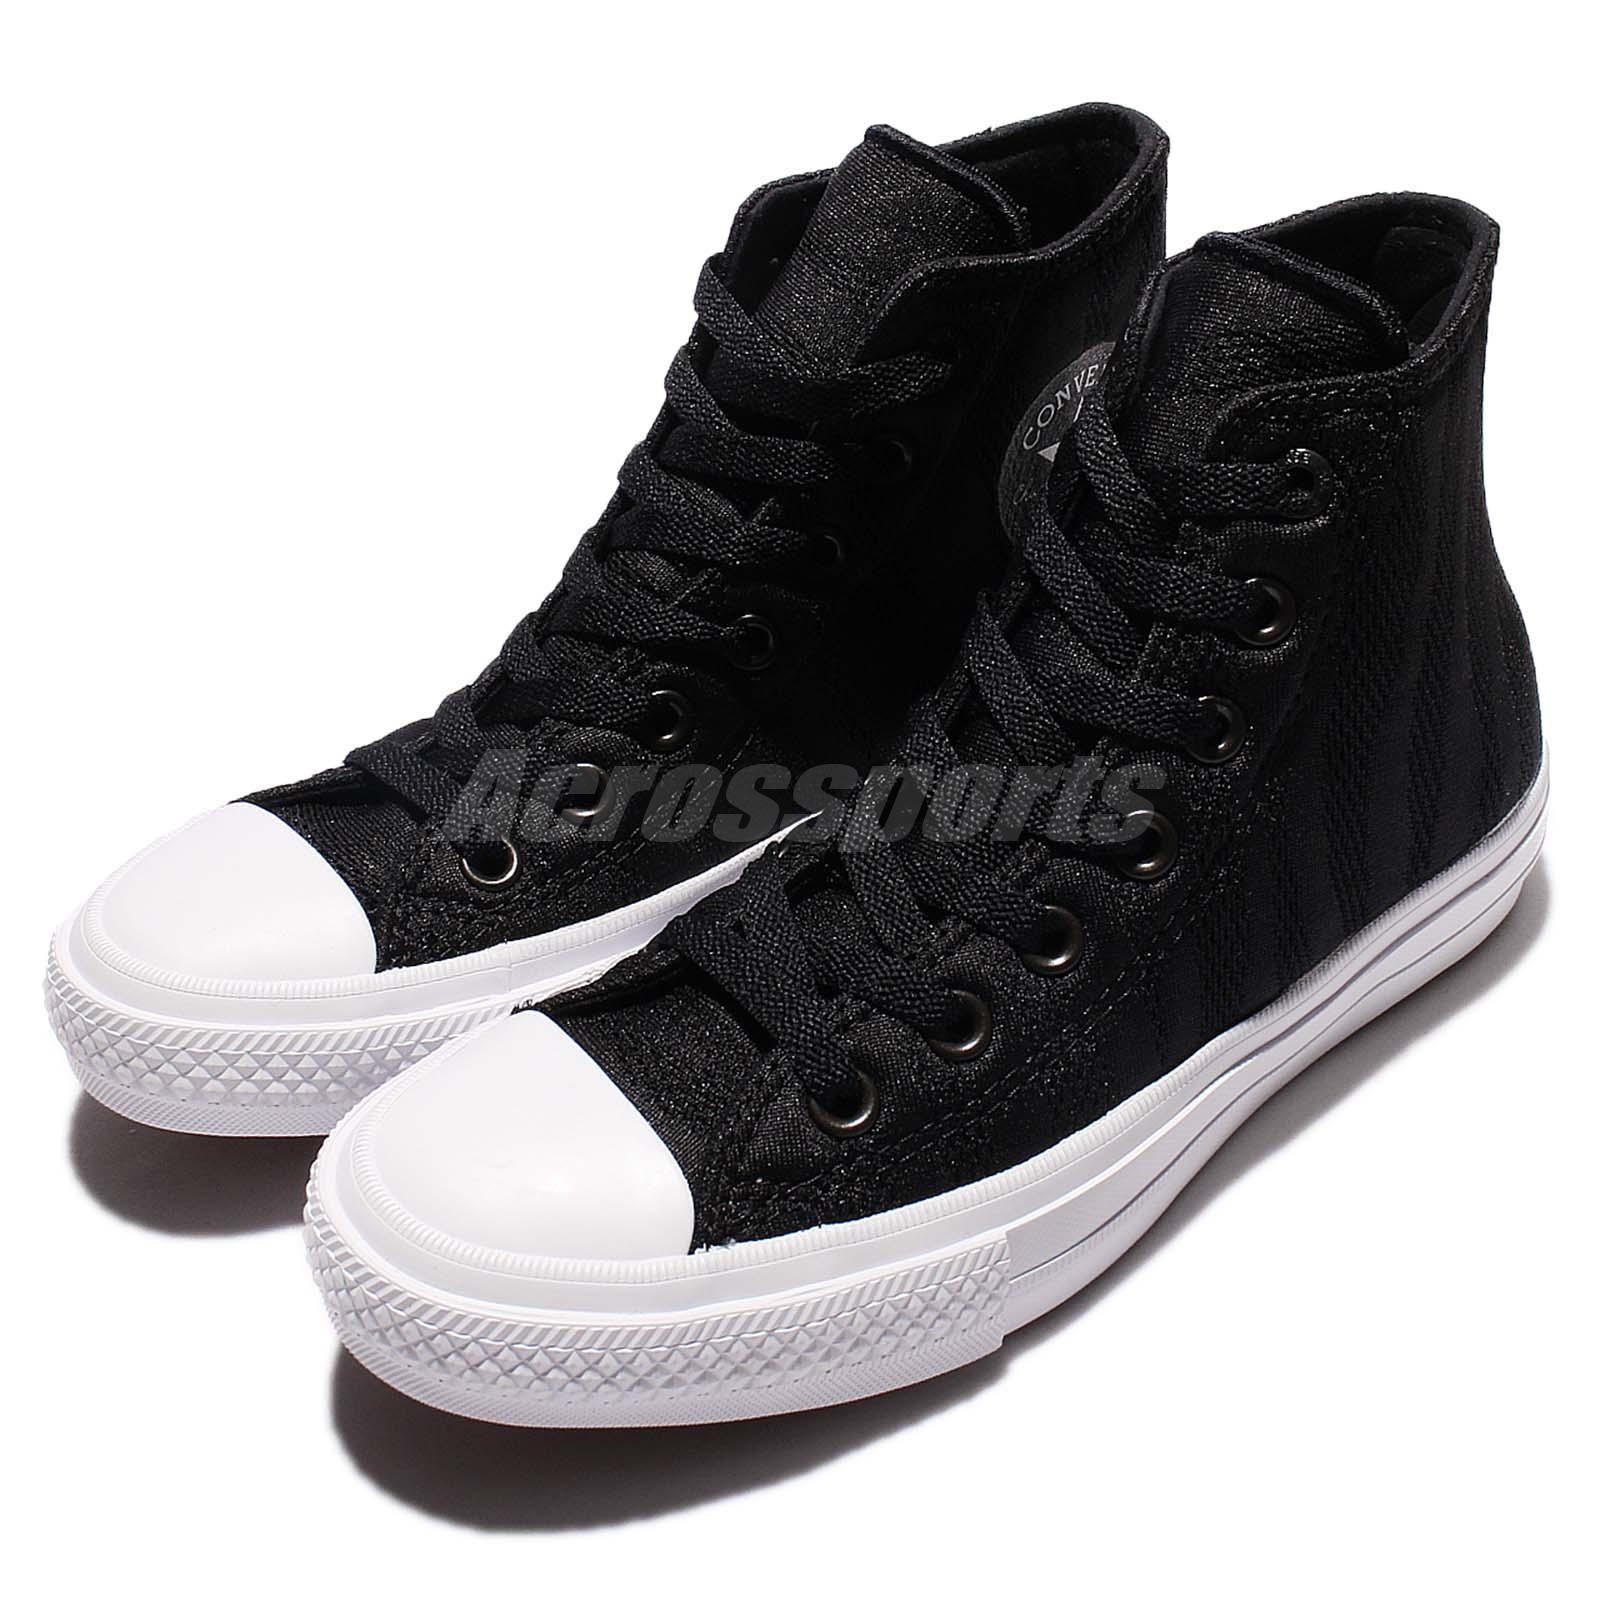 c443d2fe48bb04 Details about Converse Chuck Taylor All Star II Black White Canvas Men Women  Shoes 155493C